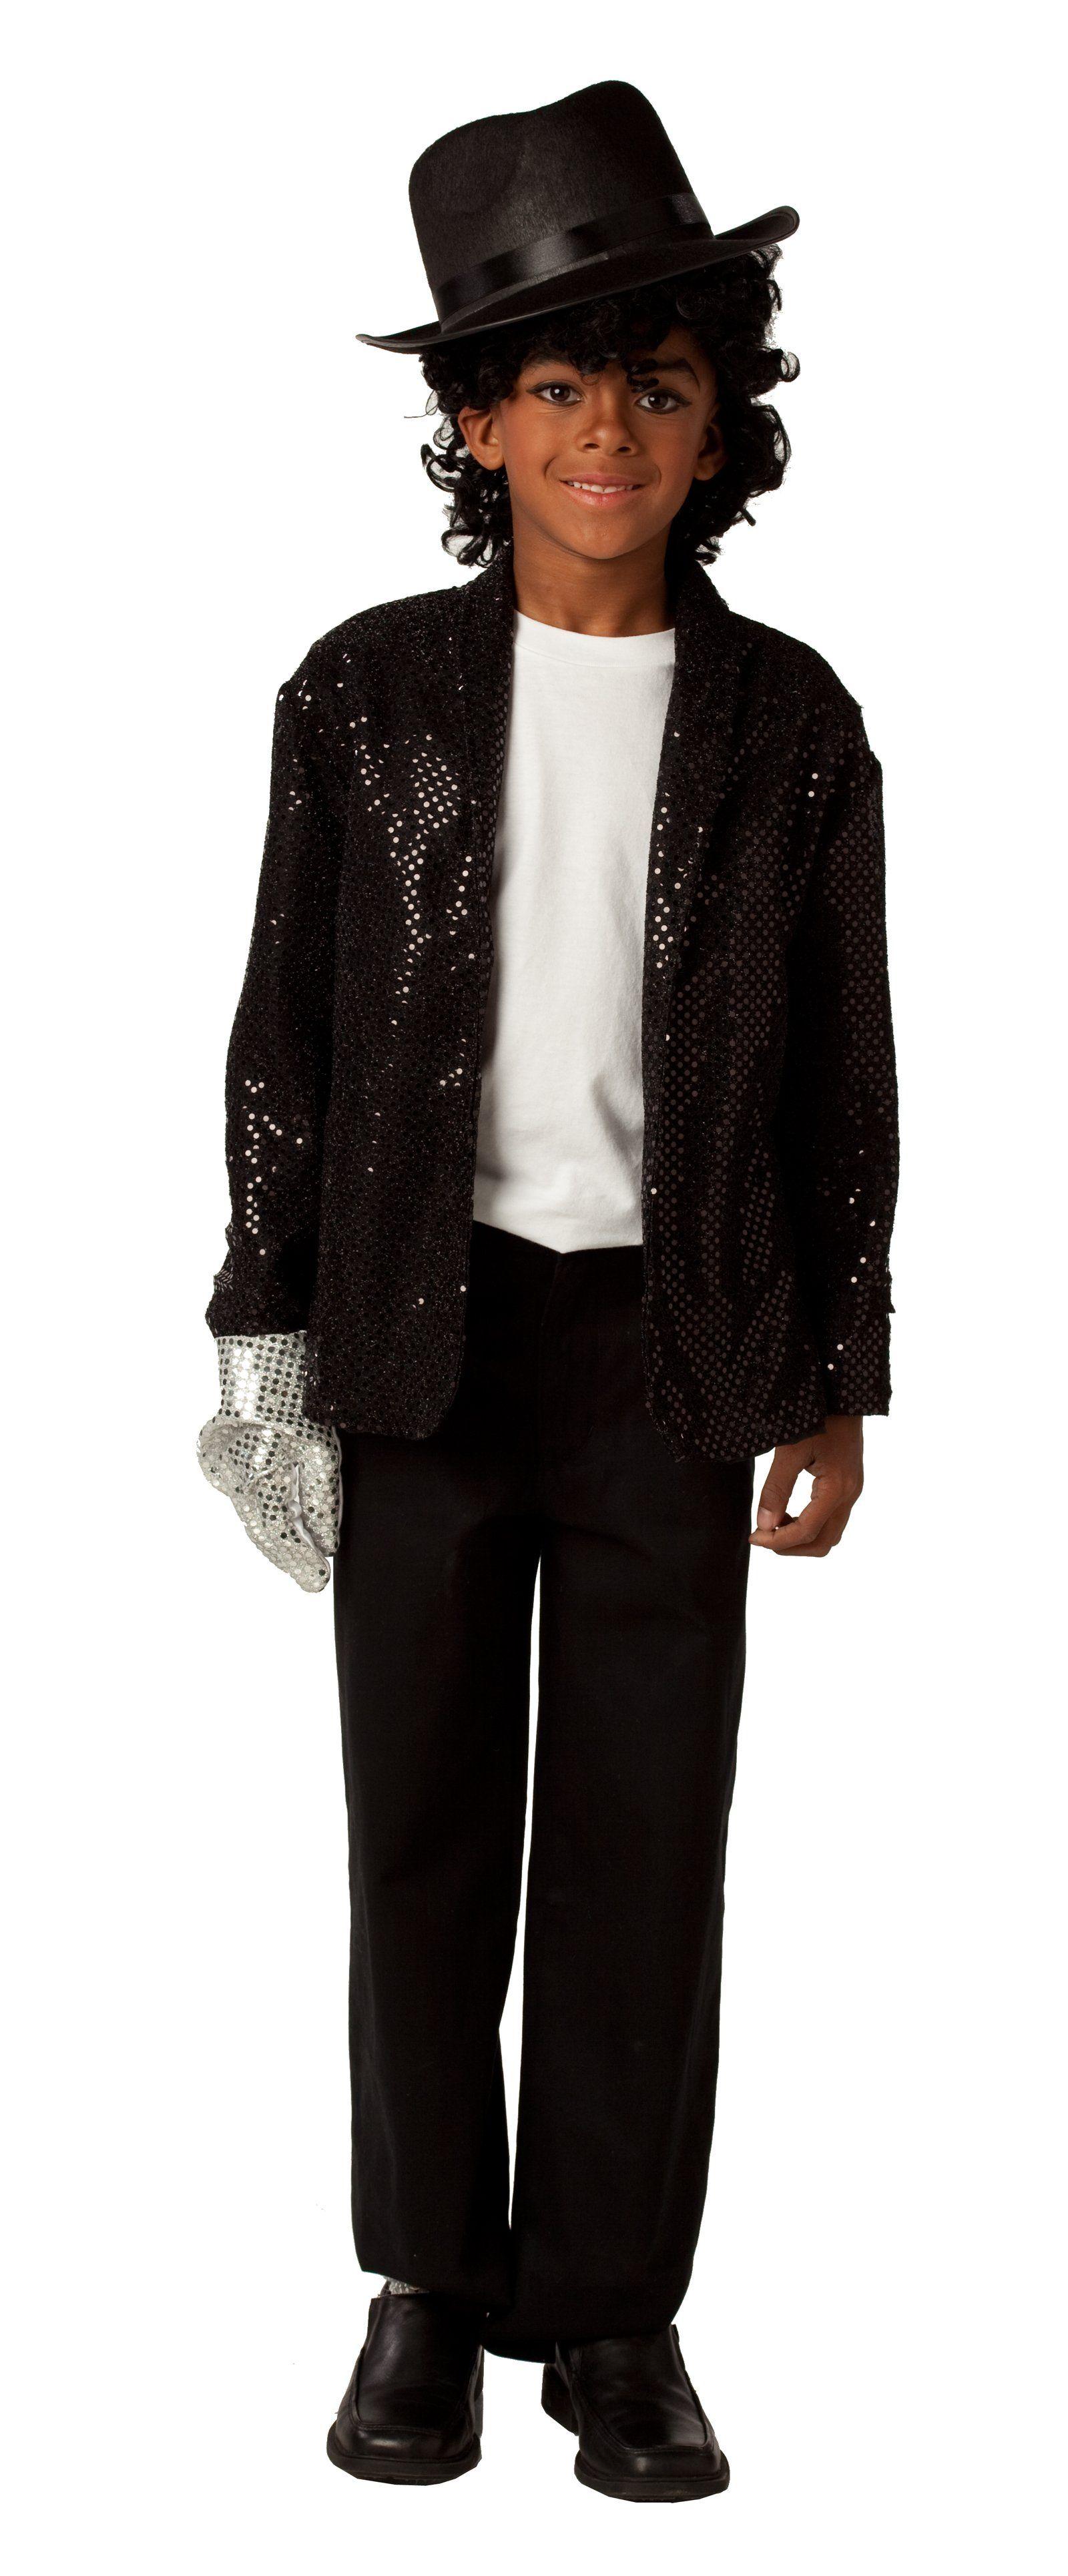 Michael Jackson Deluxe Billie Jean Child Jacket Michael Jackson Costume Party City Costumes Michael Jackson [ 3860 x 1600 Pixel ]